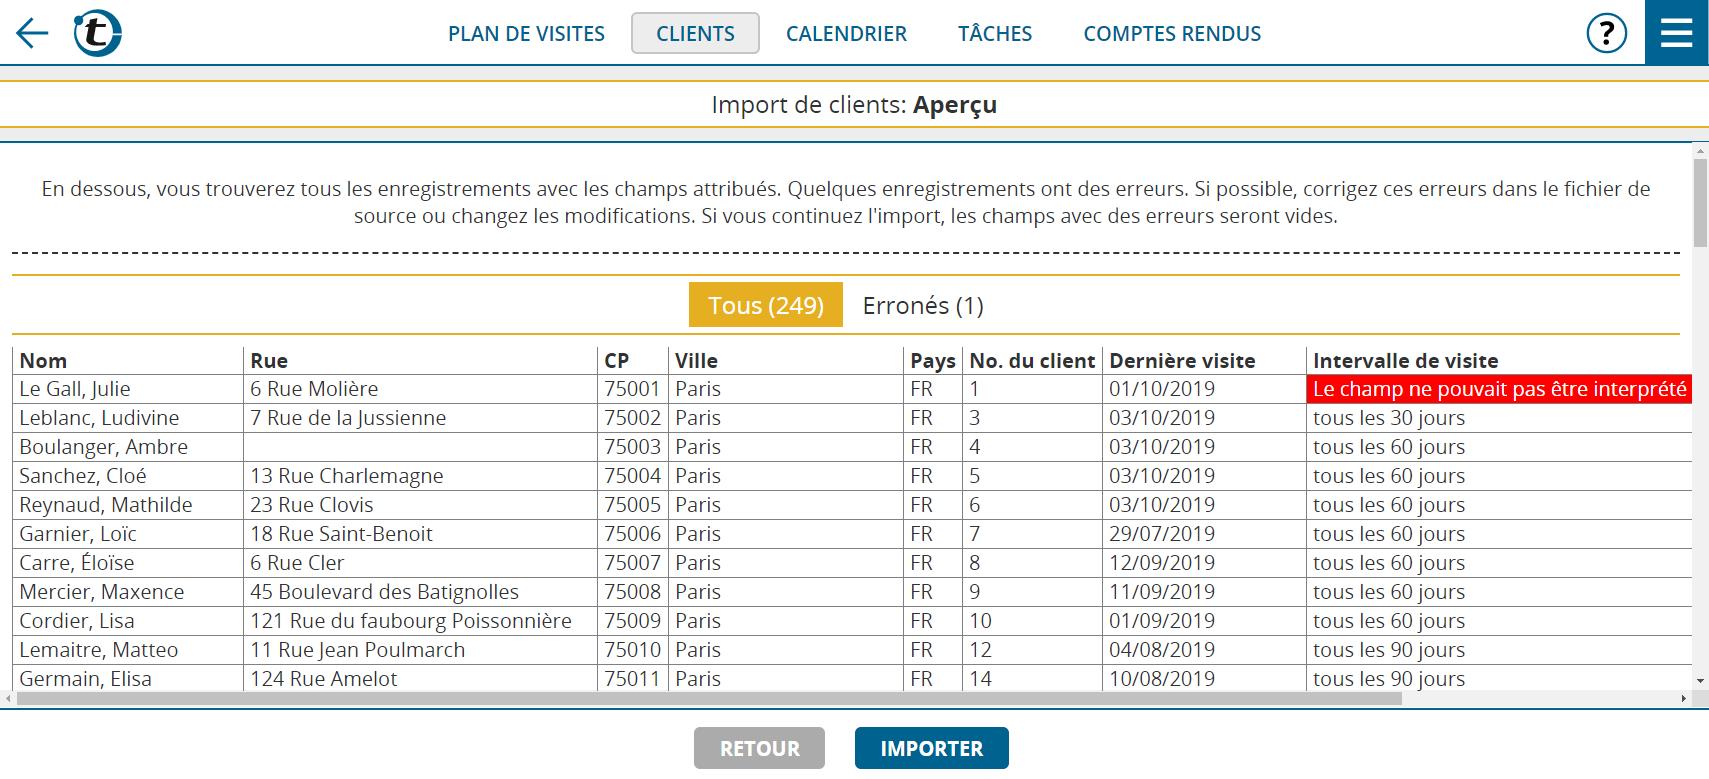 customerimport-preview-fr.png